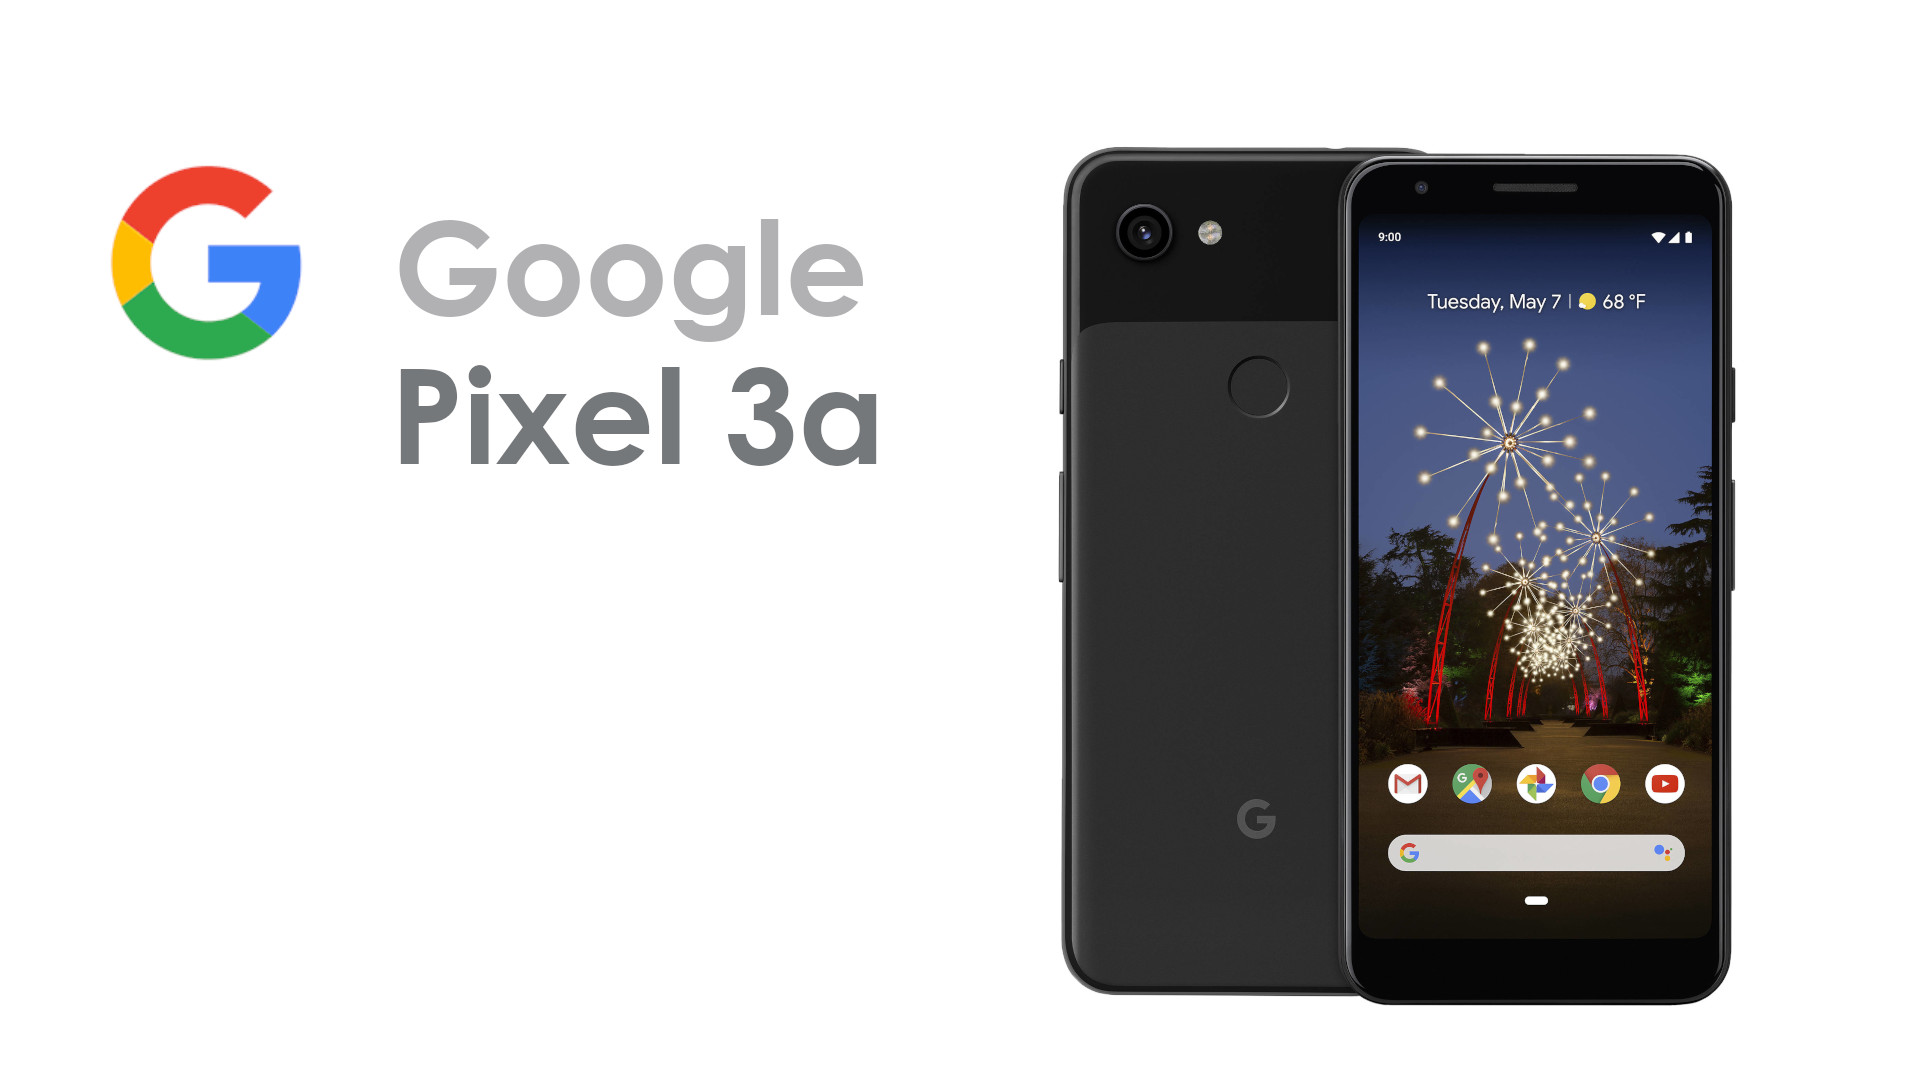 Camera, Google Pixel 3a Review, Google Pixel 3a Camera, Google Pixel 3a Cost, google pixel news, pixel 3a Verizon, pixel 3a Sprint, pixel 3a Tmobile